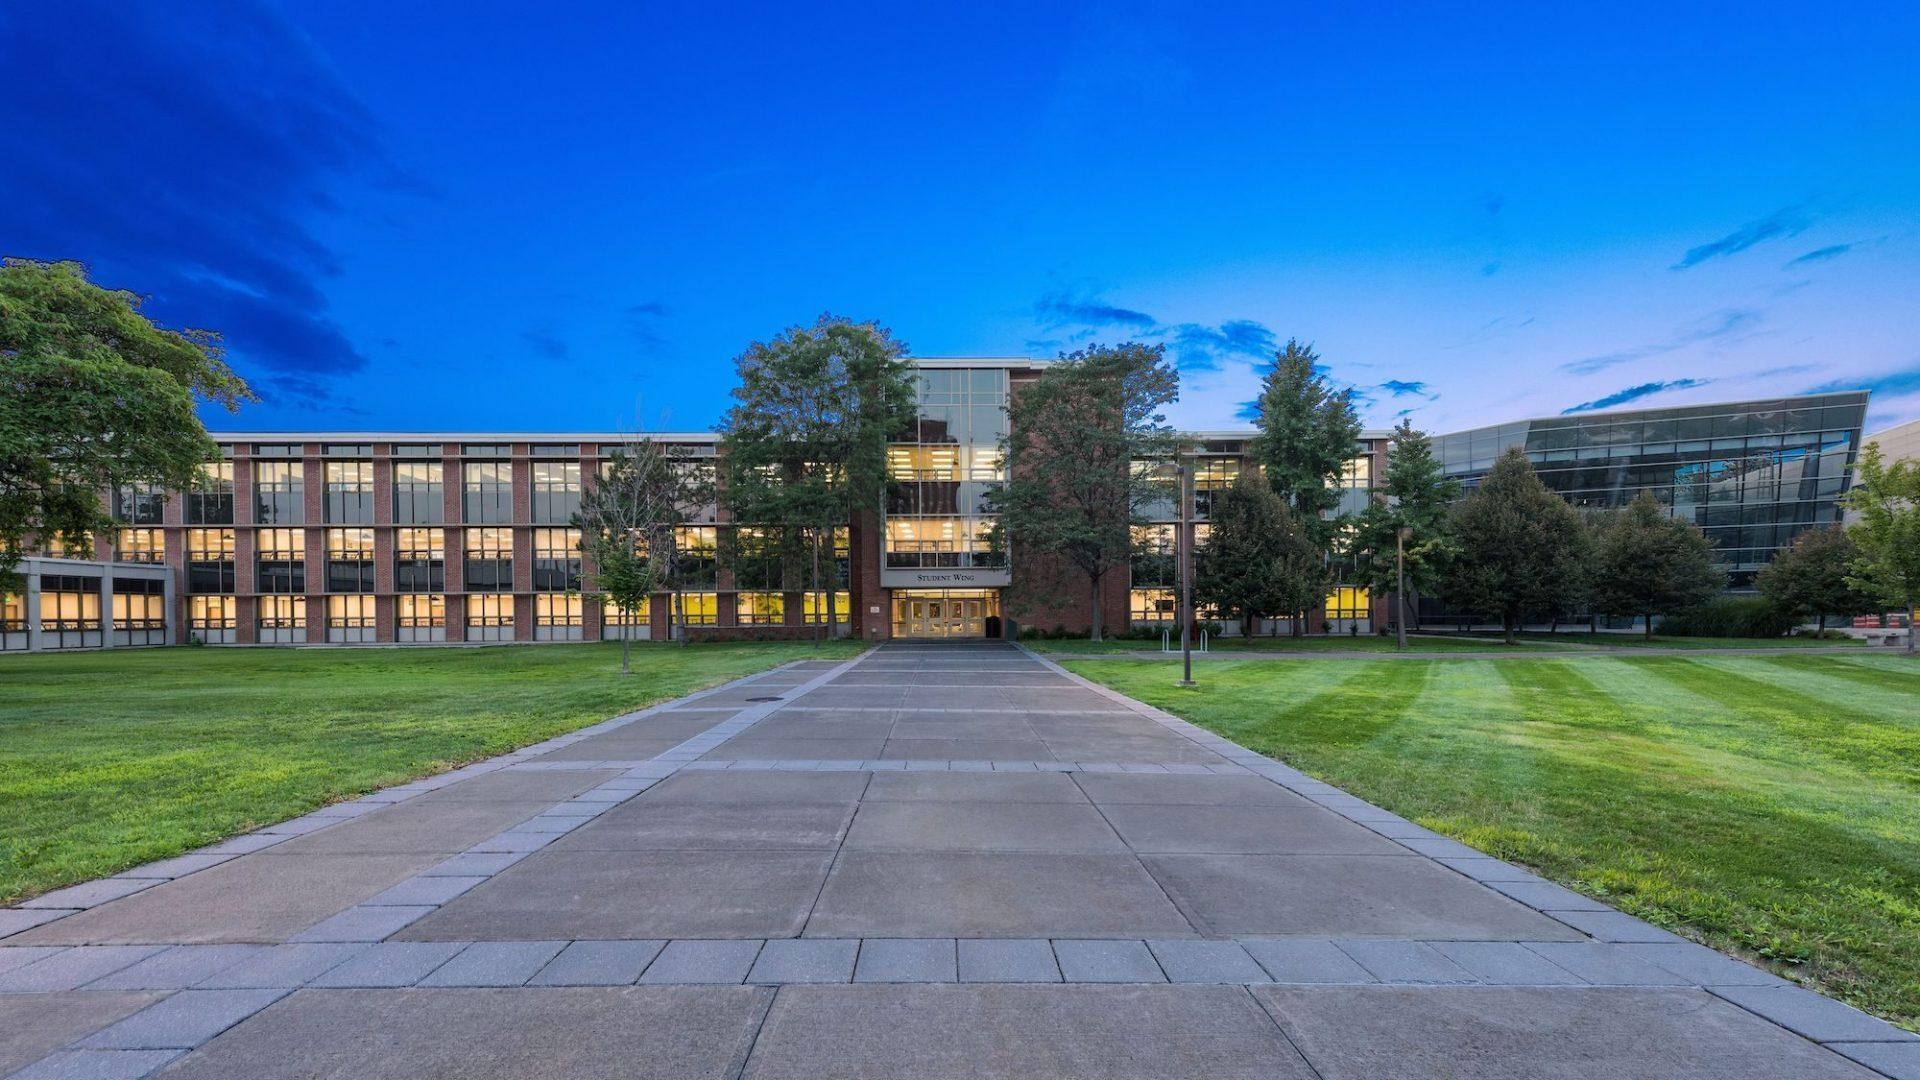 Binghamton Student Wing Exterior 1